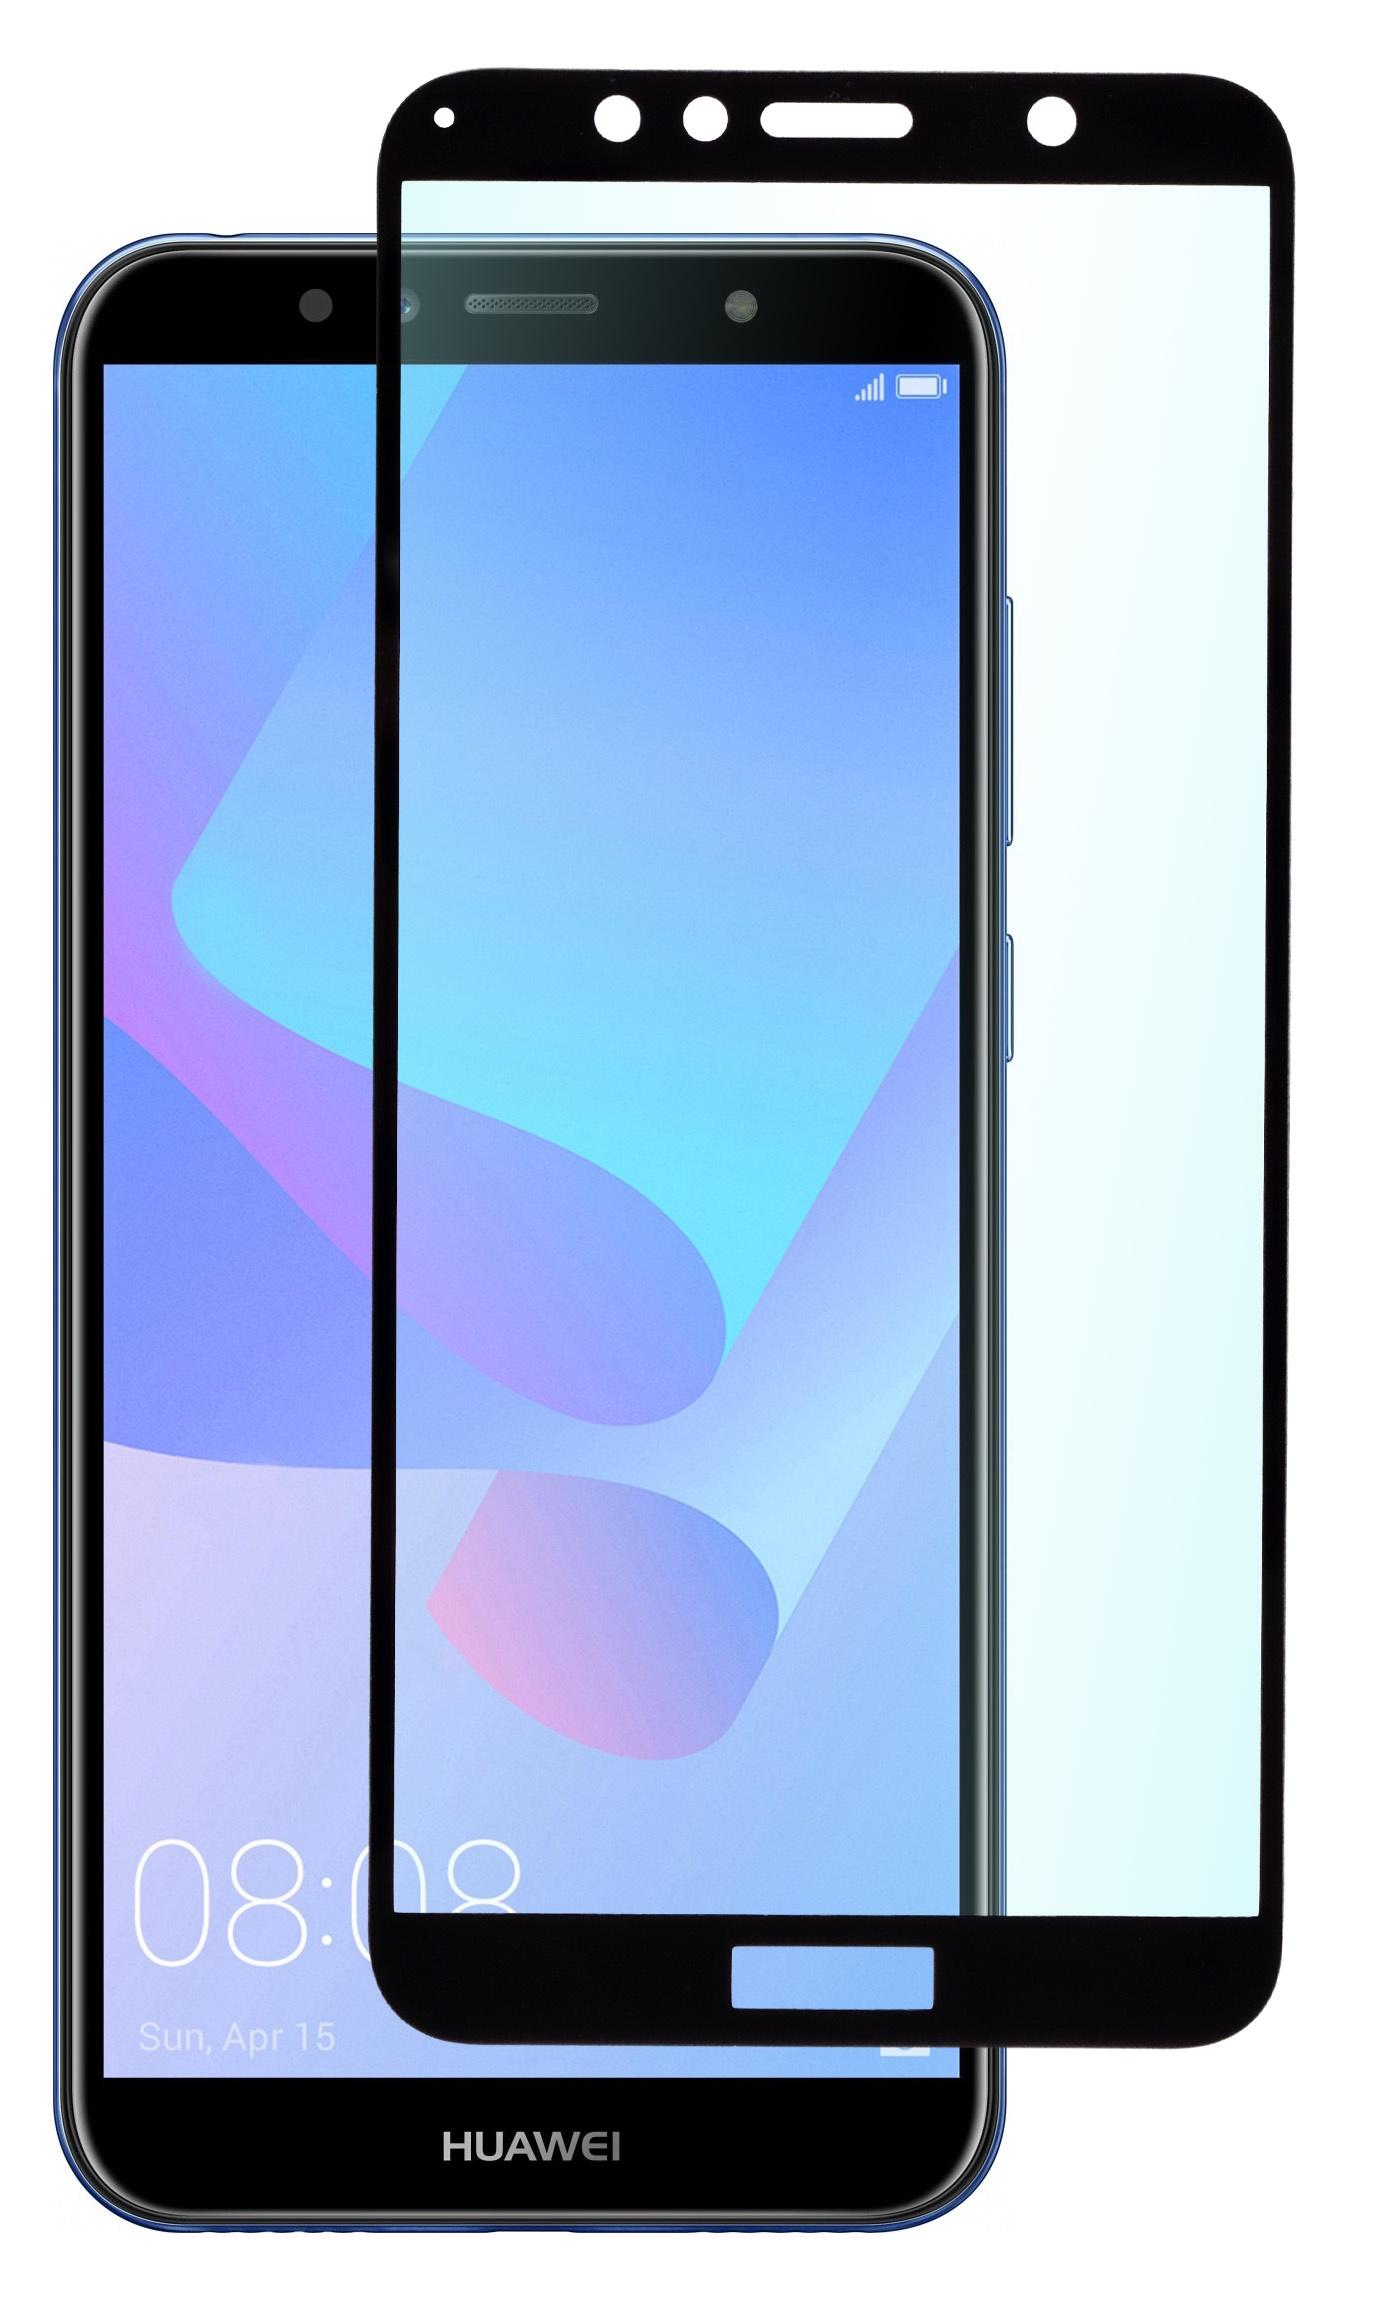 Защитное стекло SkinBOX, для Huawei Y6 Prime/ Y6/ Honor 7A Pro, 4630042522428, черный аксессуар защитное стекло для huawei honor 7c 7a pro luxcase 3d full screen black frame 77940